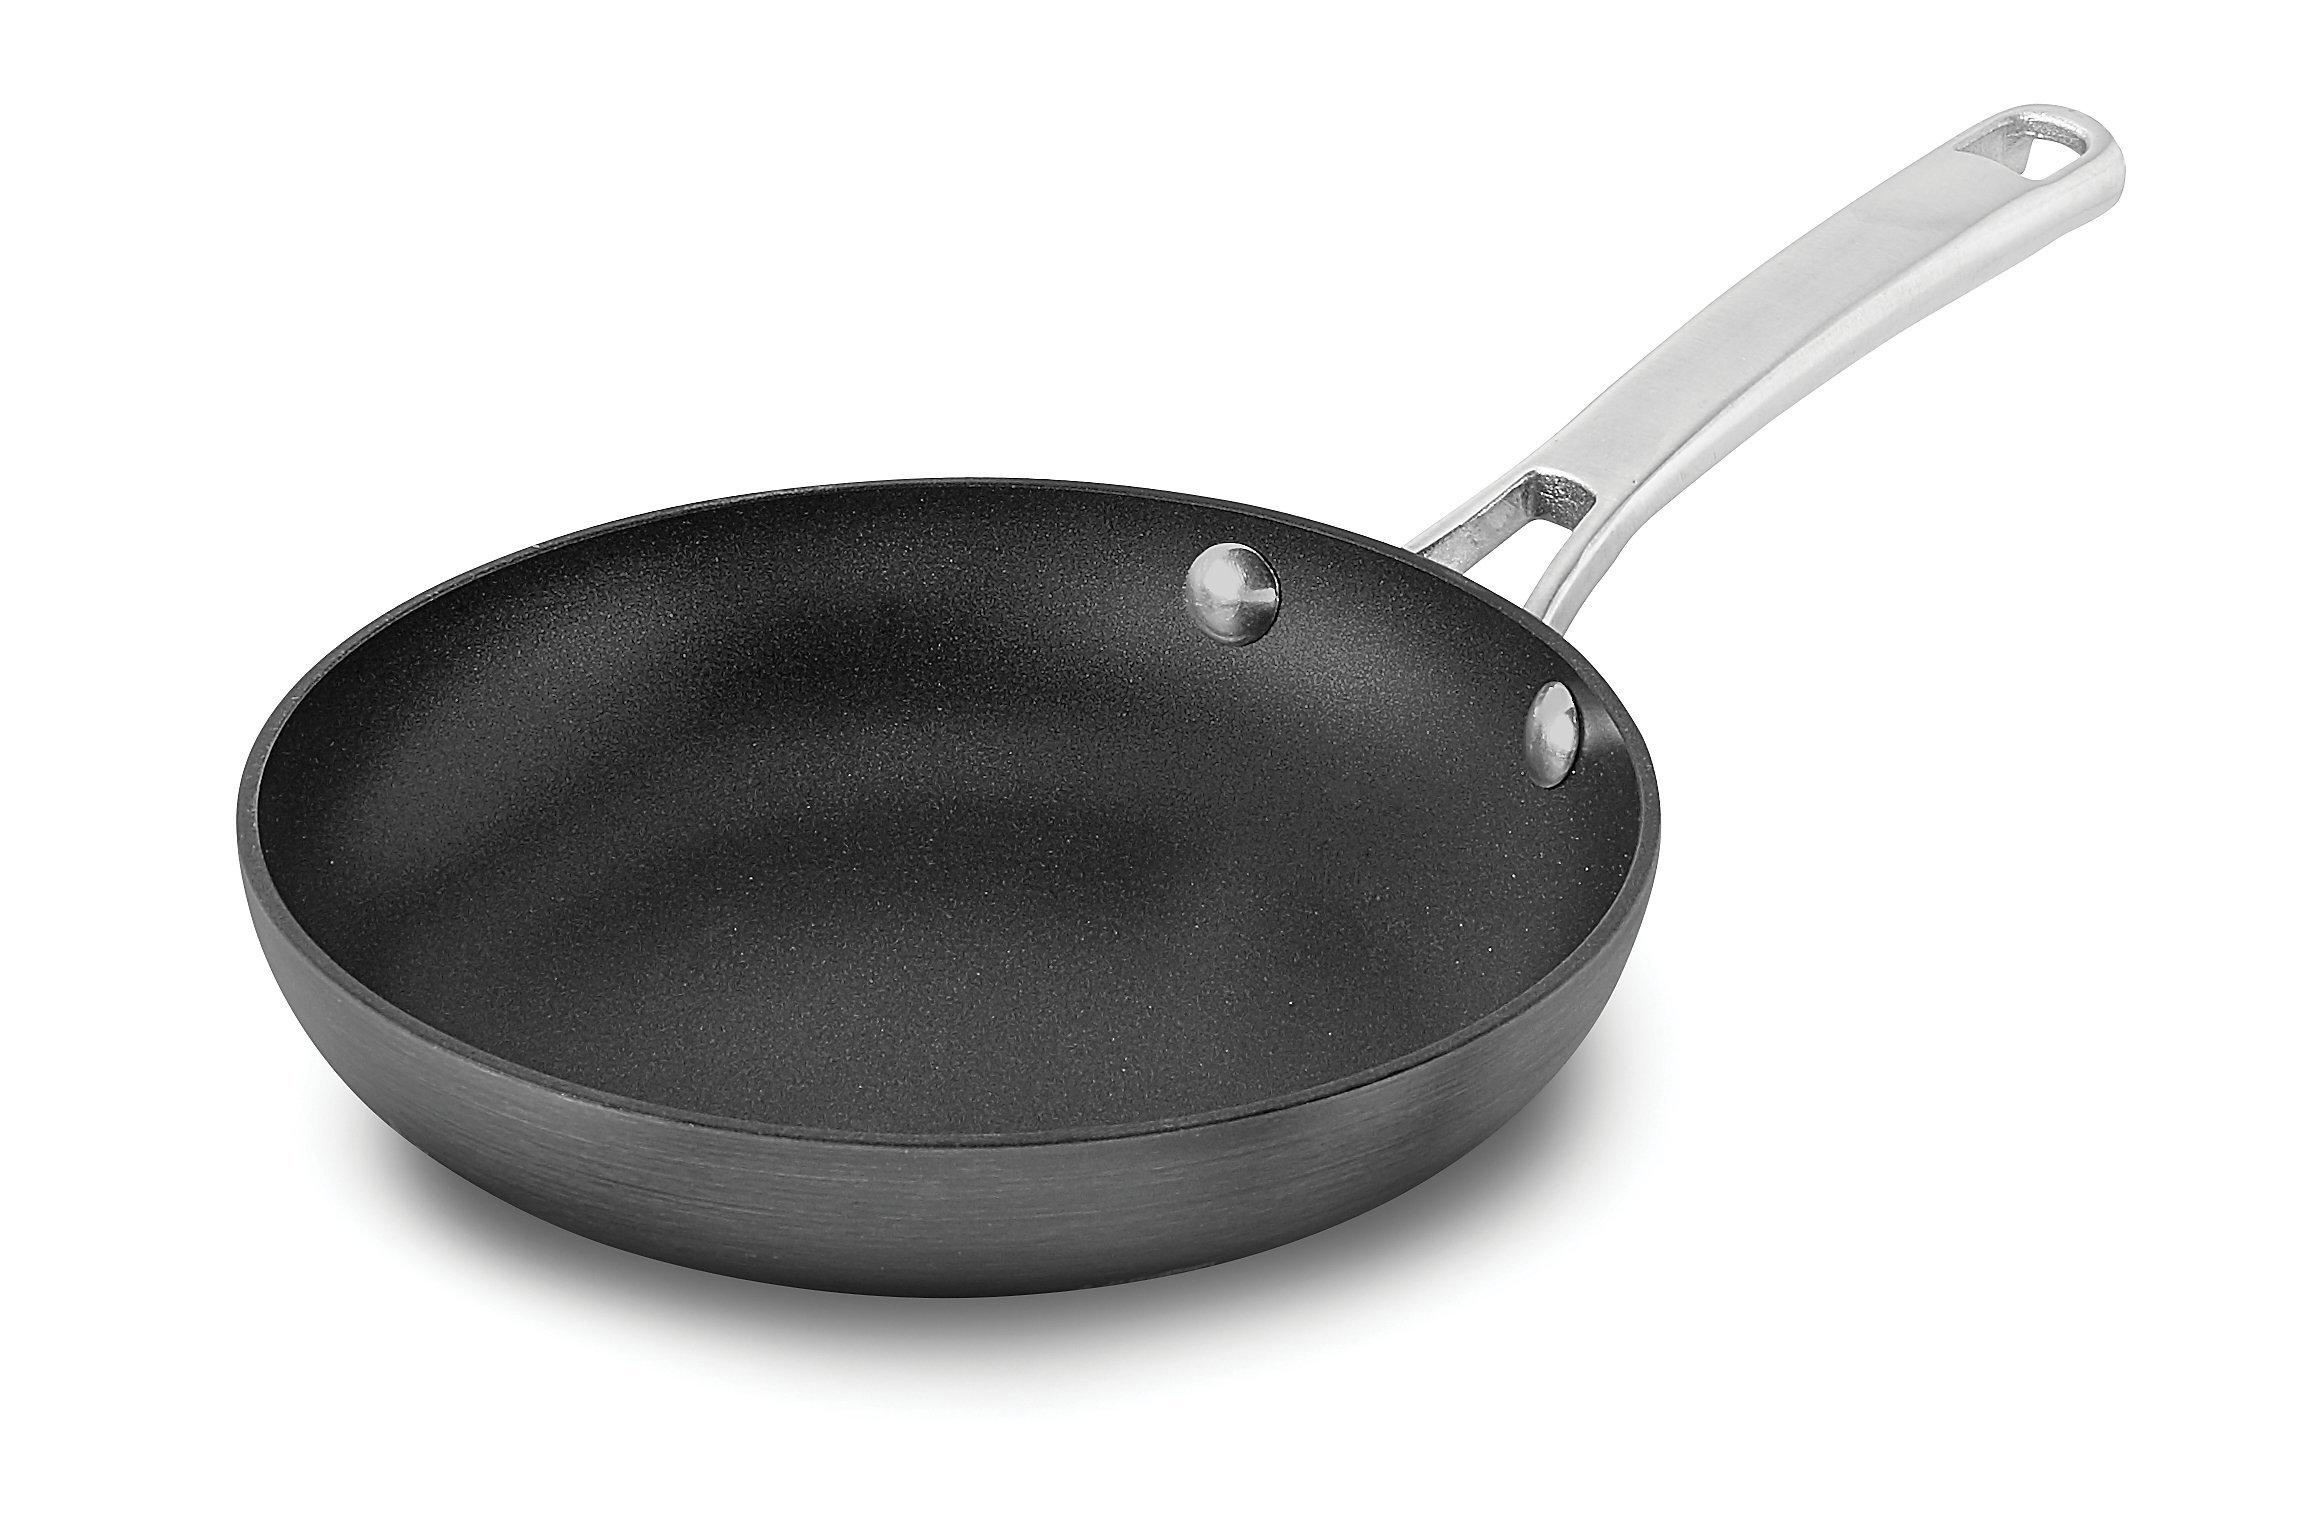 Calphalon 1934149 Classic Nonstick Omelet Fry Pan, 8'', Grey